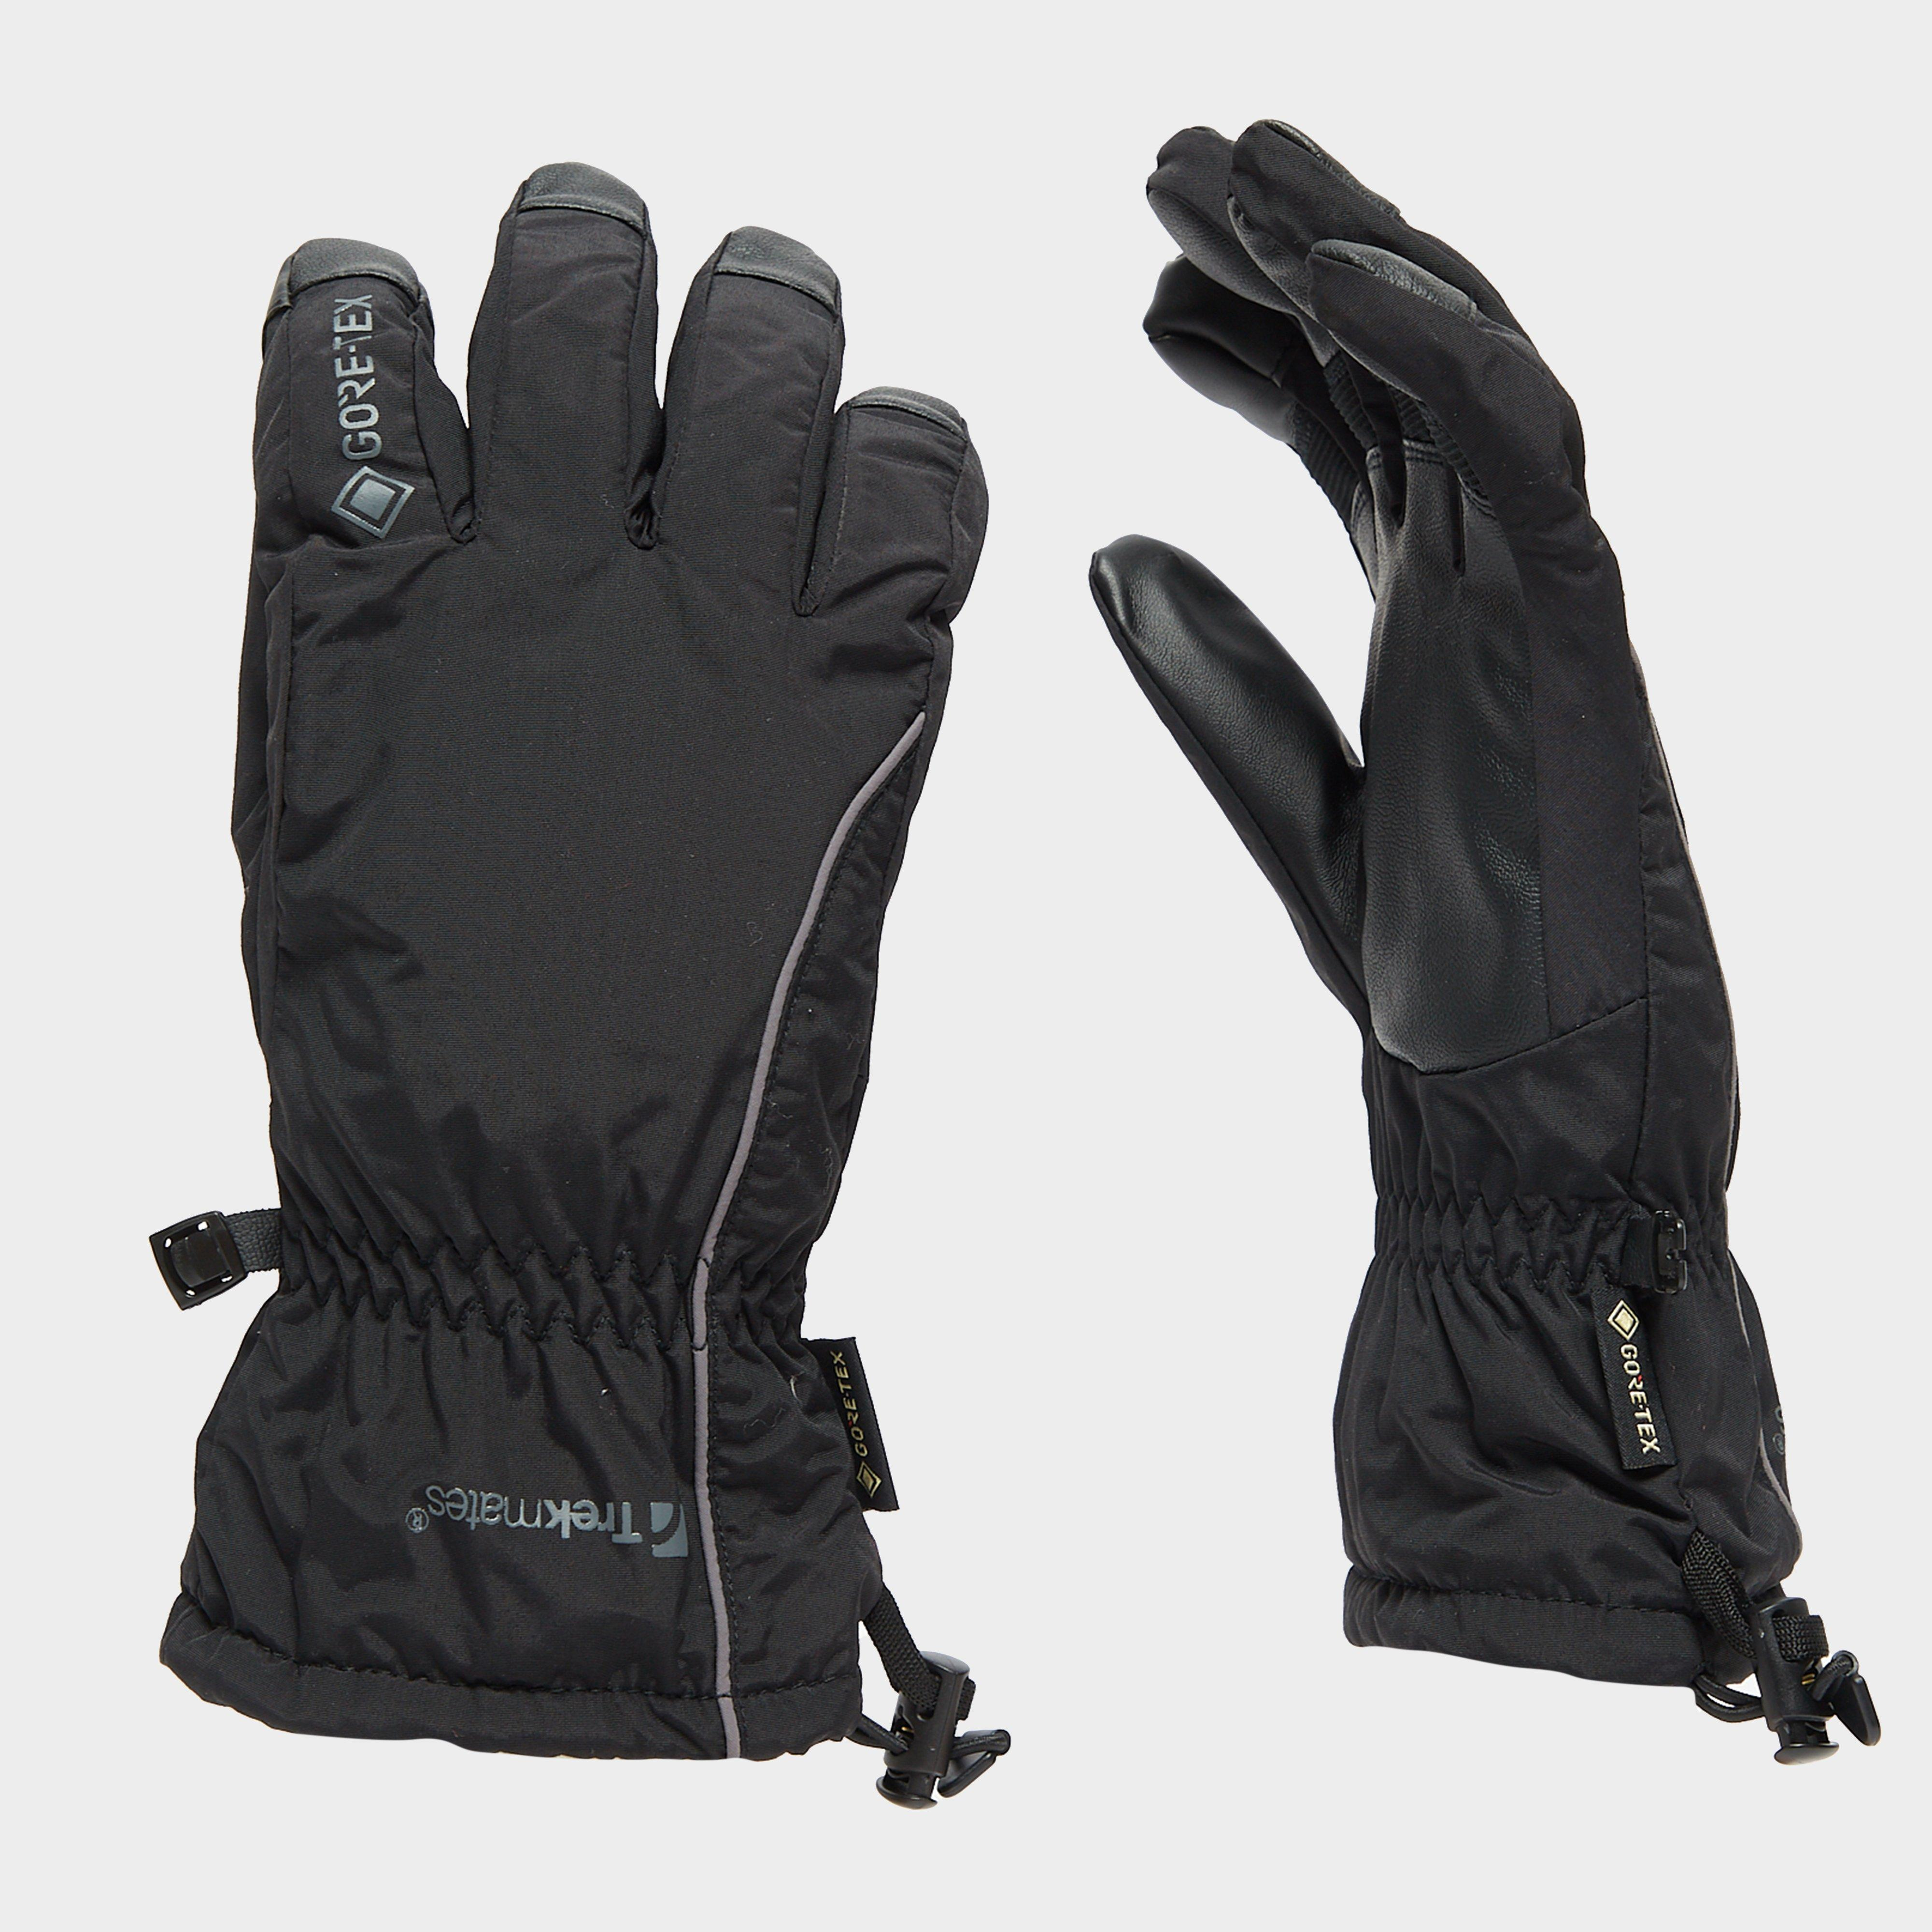 Trekmates Trekmates Mens Chamonix GORE-TEX Gloves - Black, Black